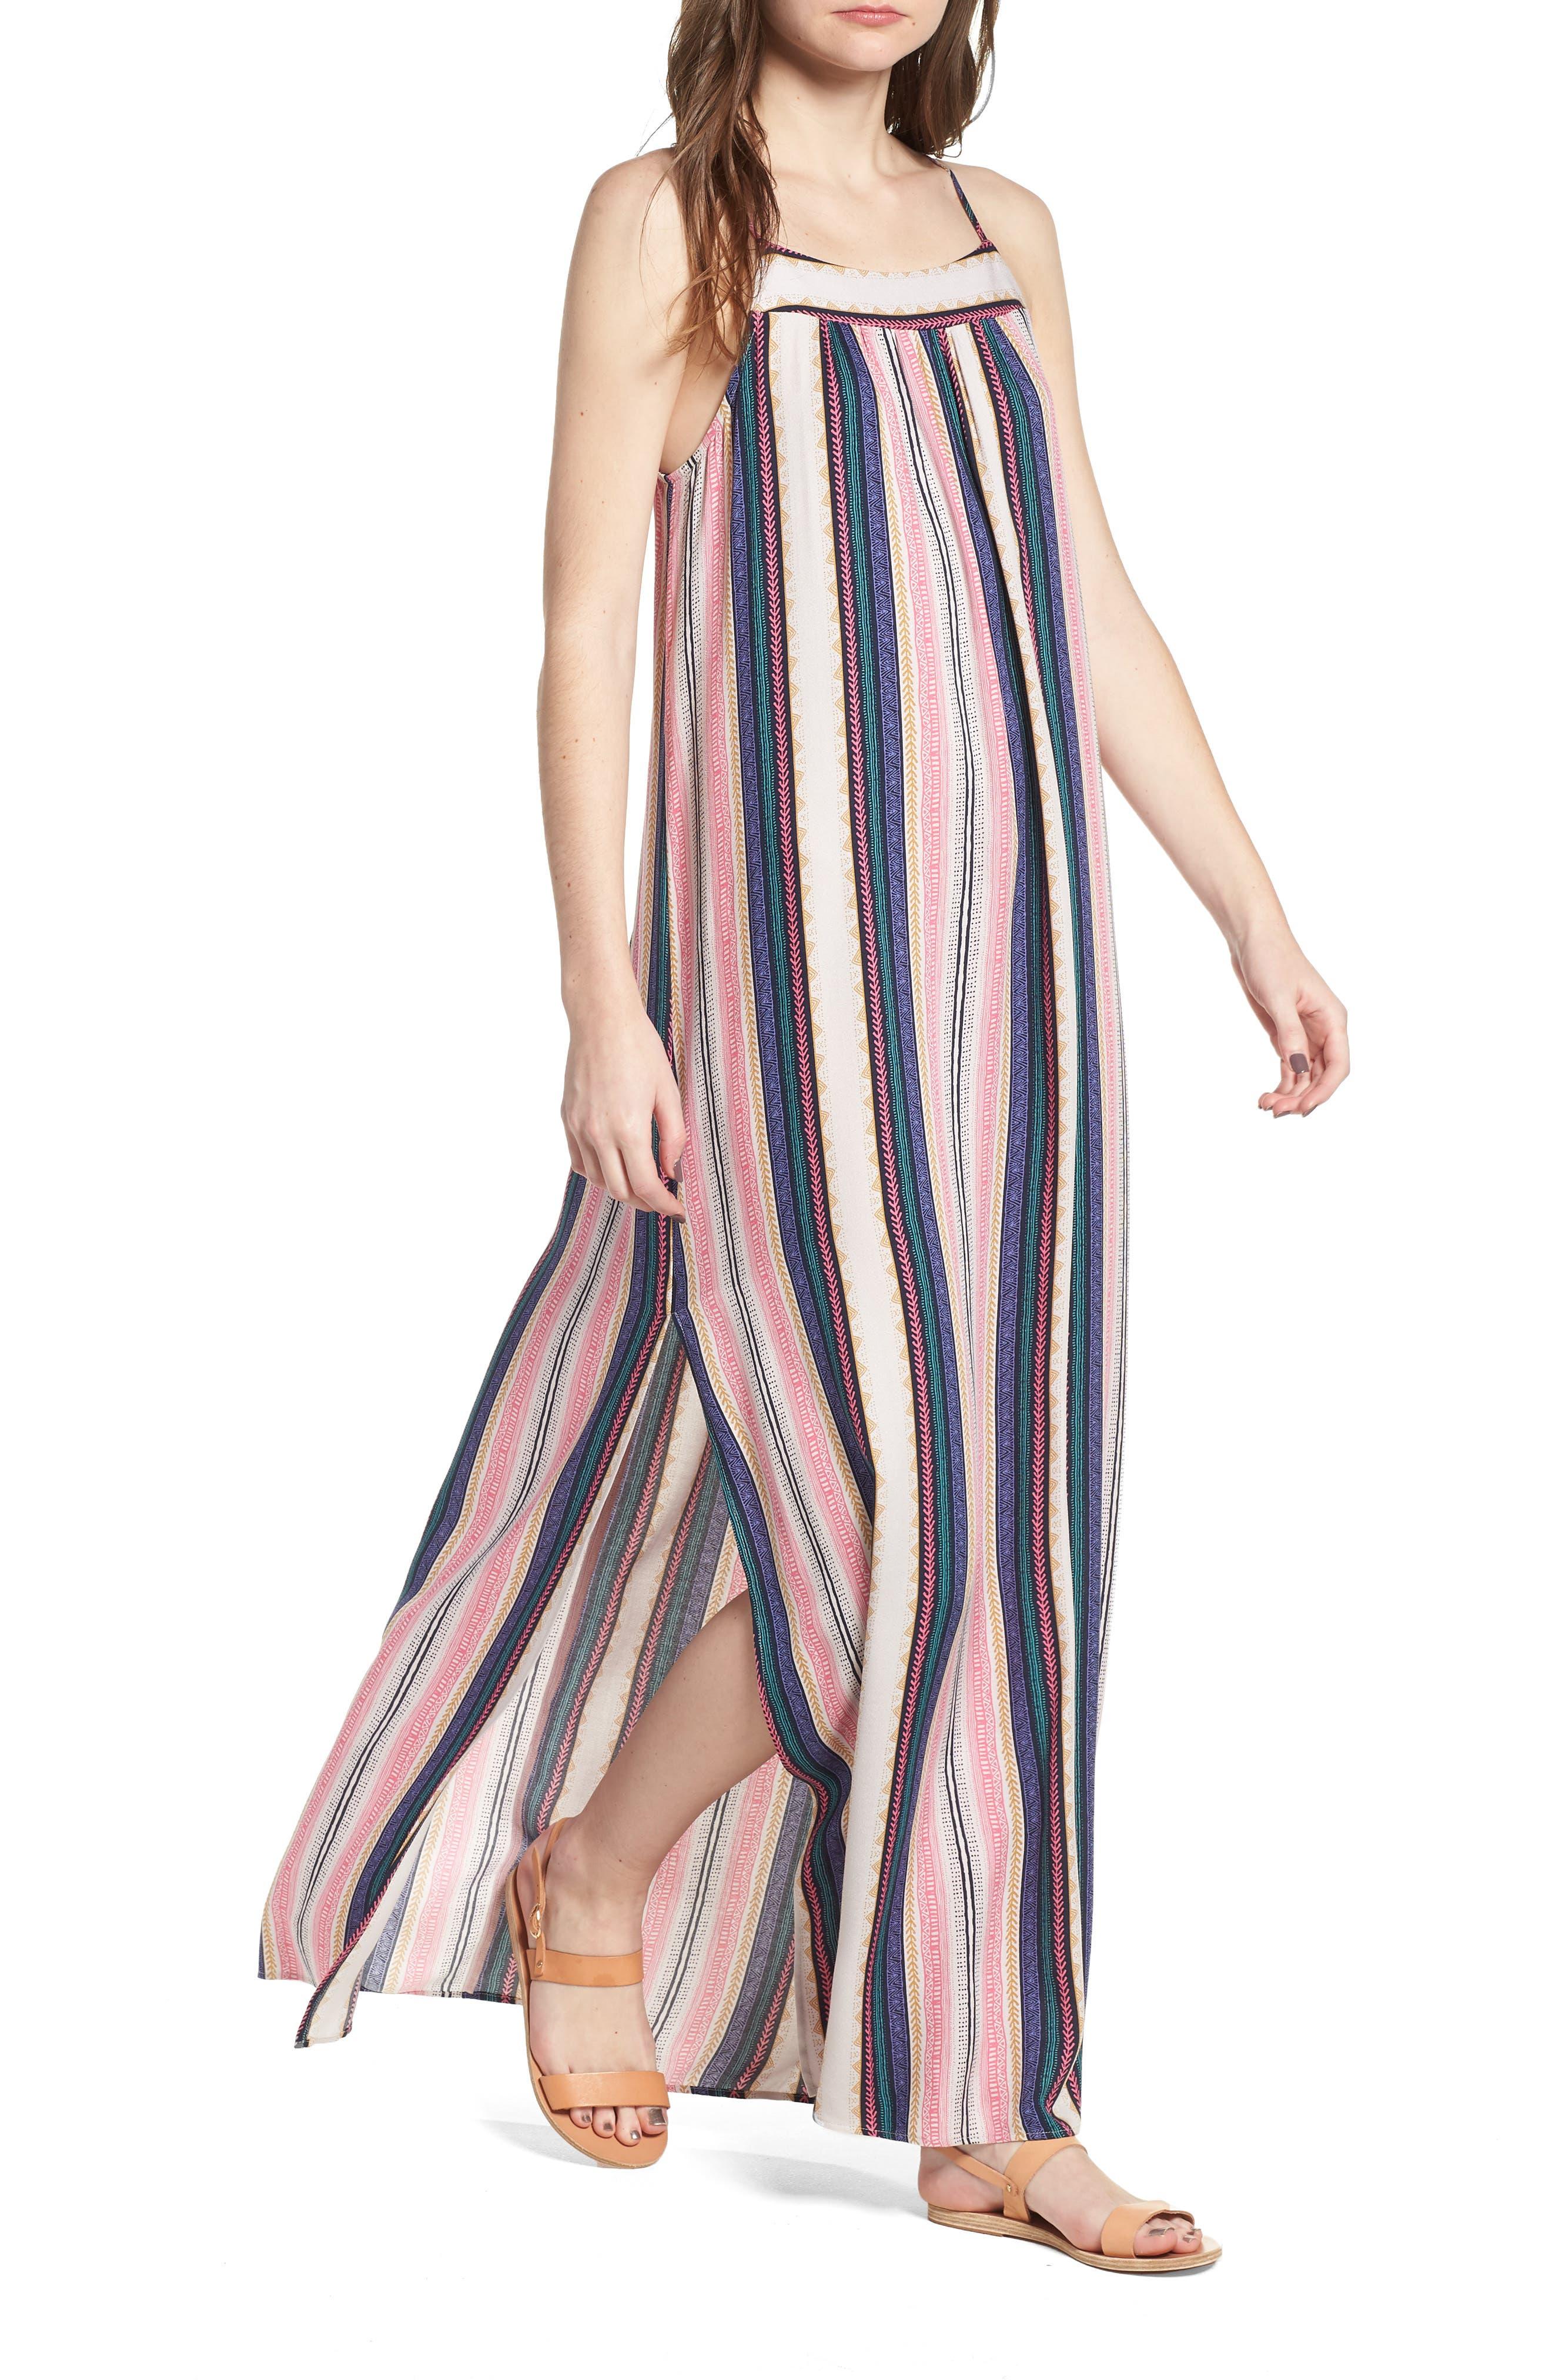 ONE CLOTHING,                             Stripe Maxi Dress,                             Main thumbnail 1, color,                             650